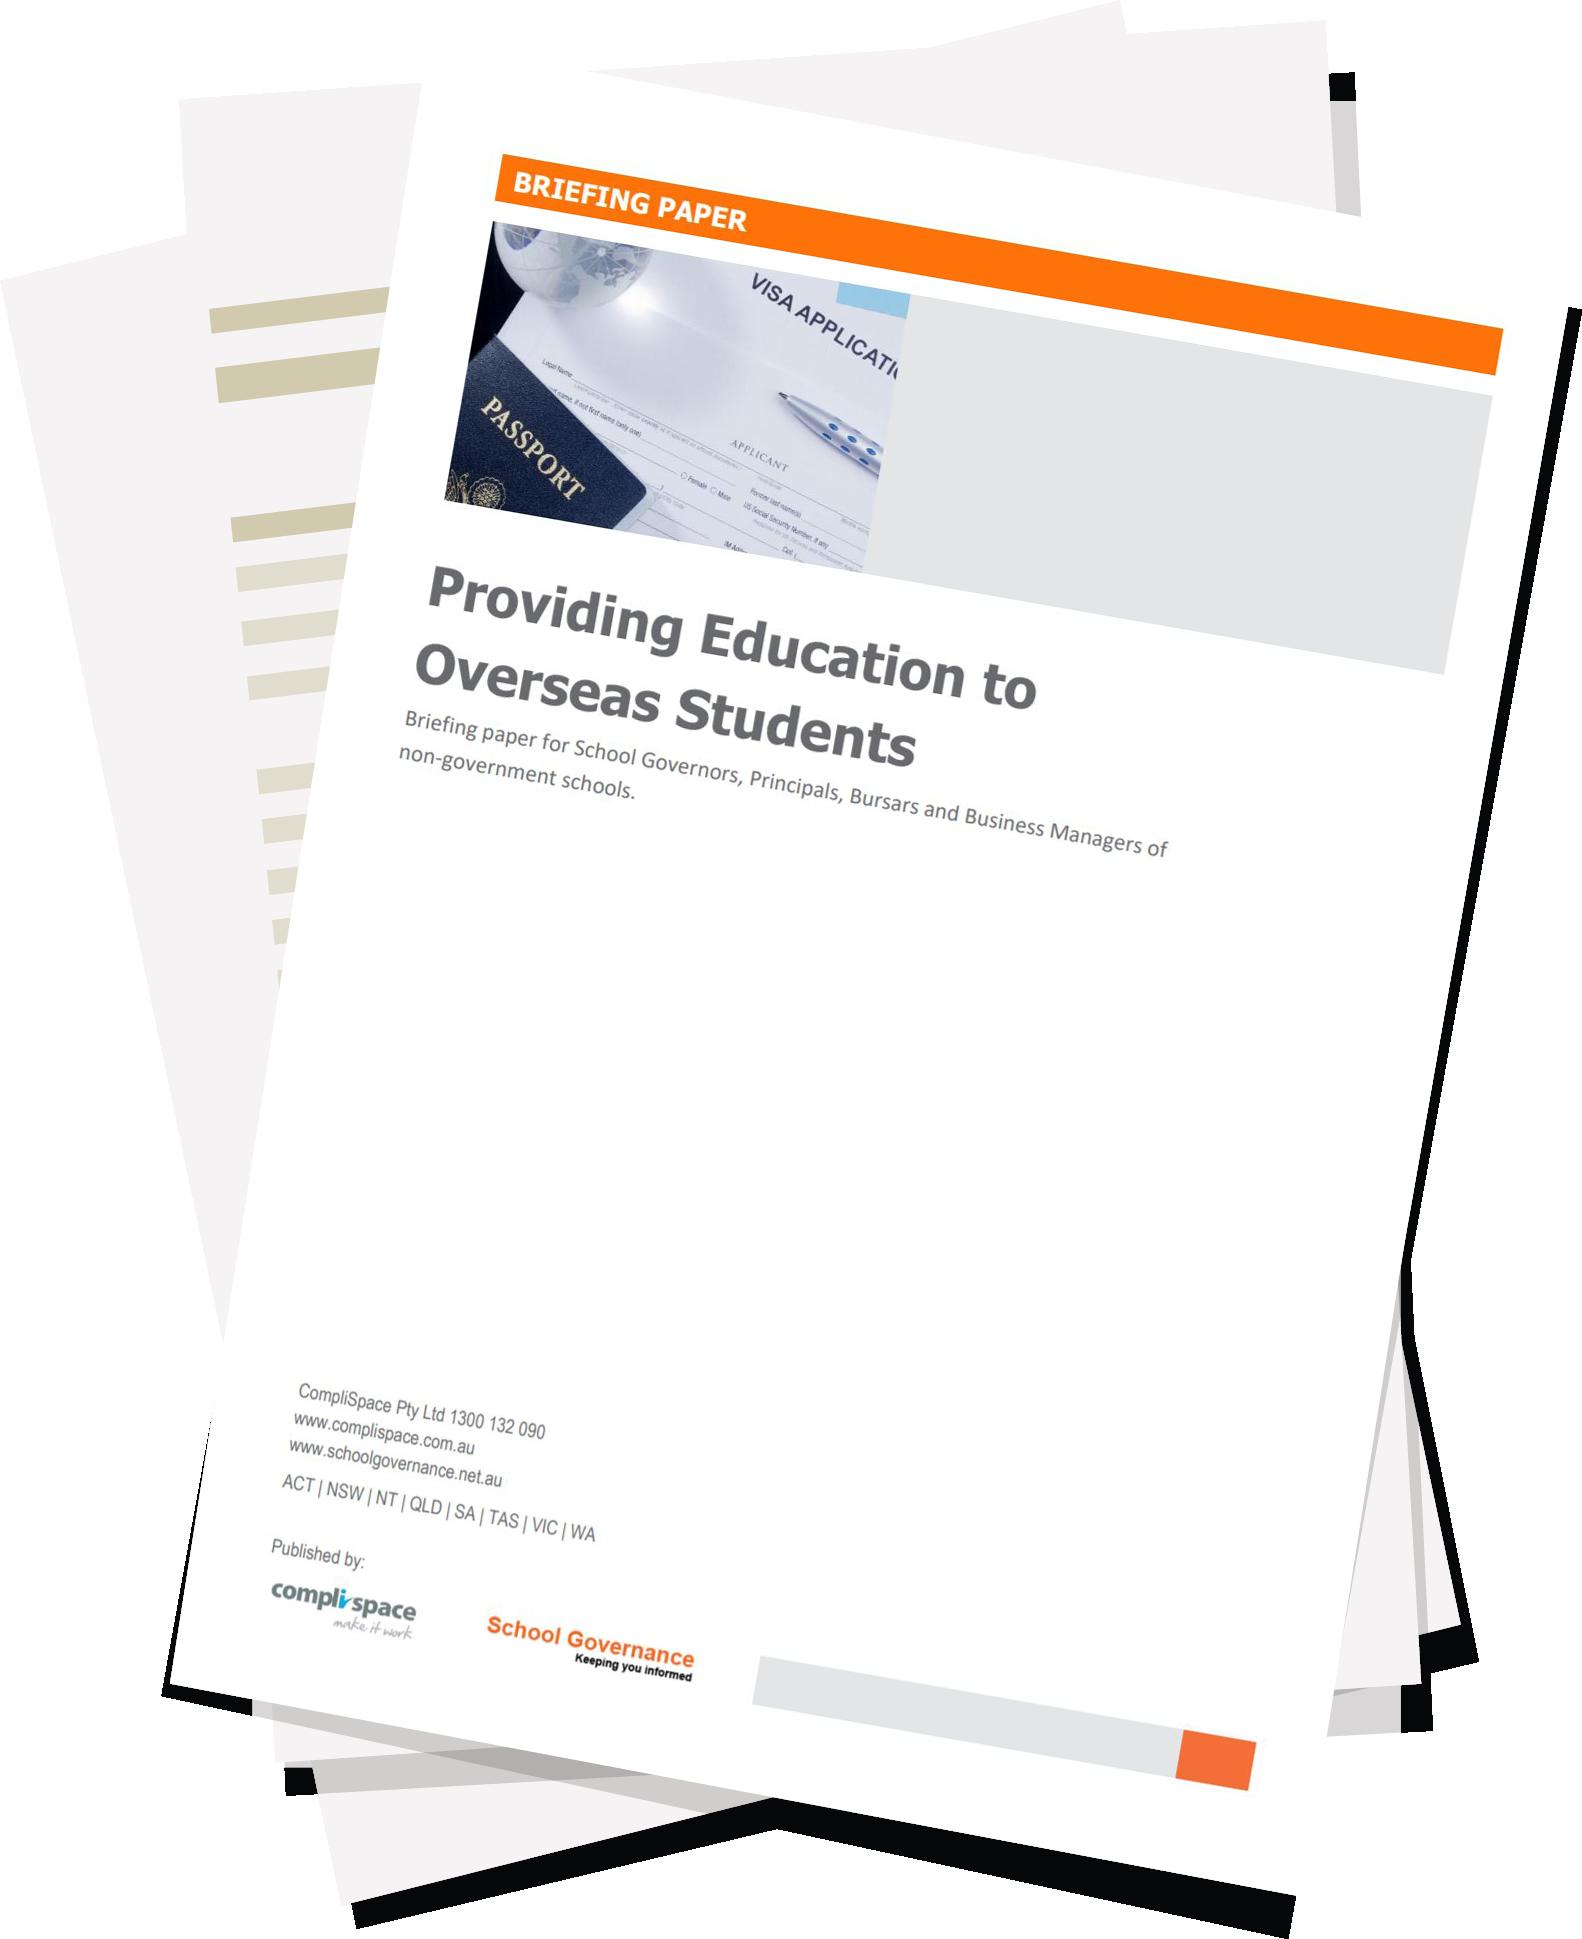 Providing Education to Overseas Students